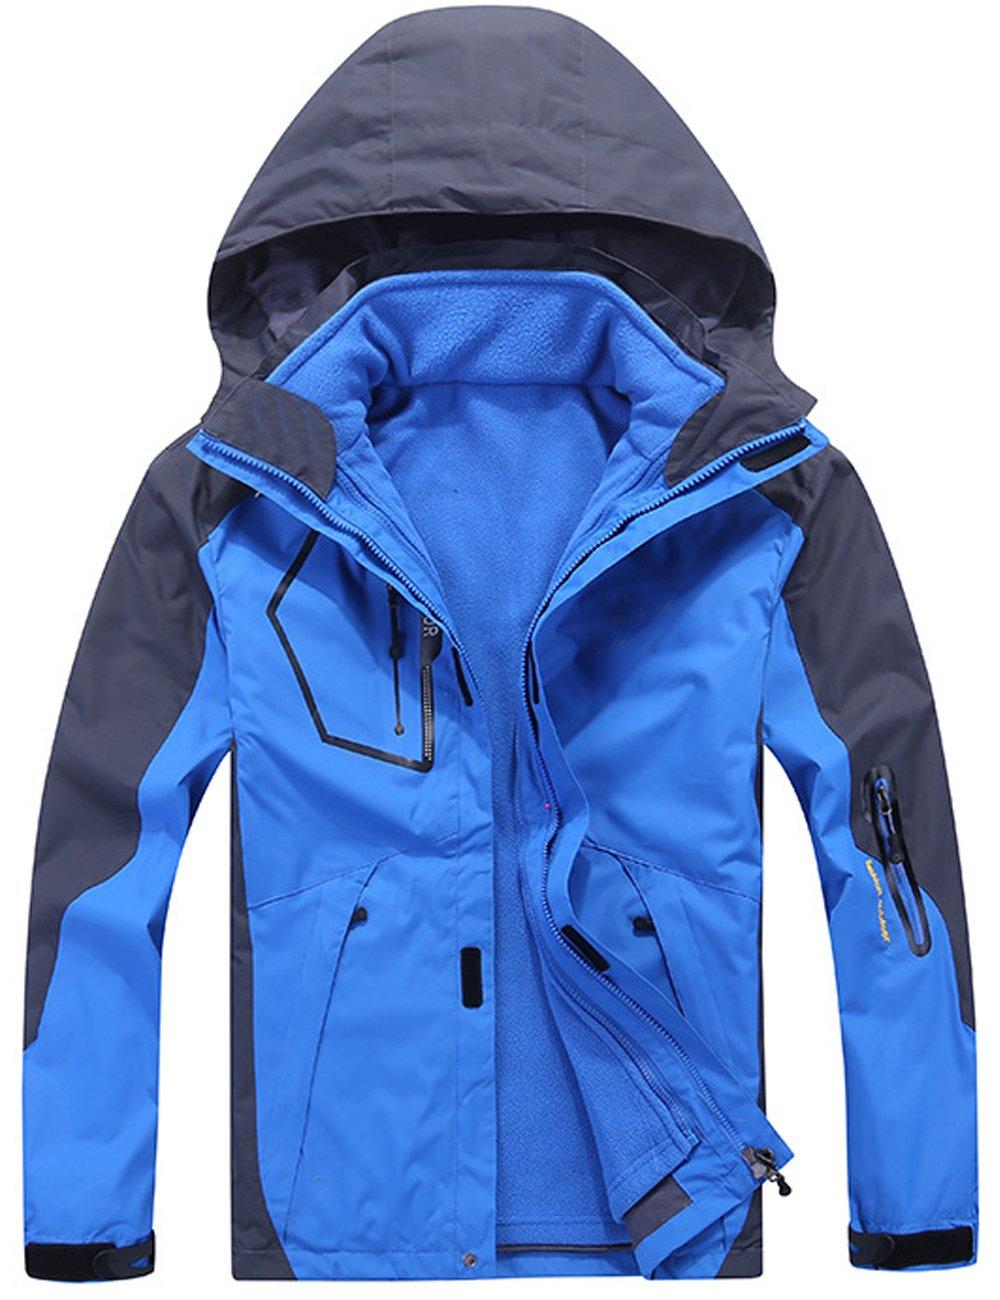 Menschwear OUTERWEAR メンズ B077C45S59 5L|Light-blue W1201 Light-blue W1201 5L